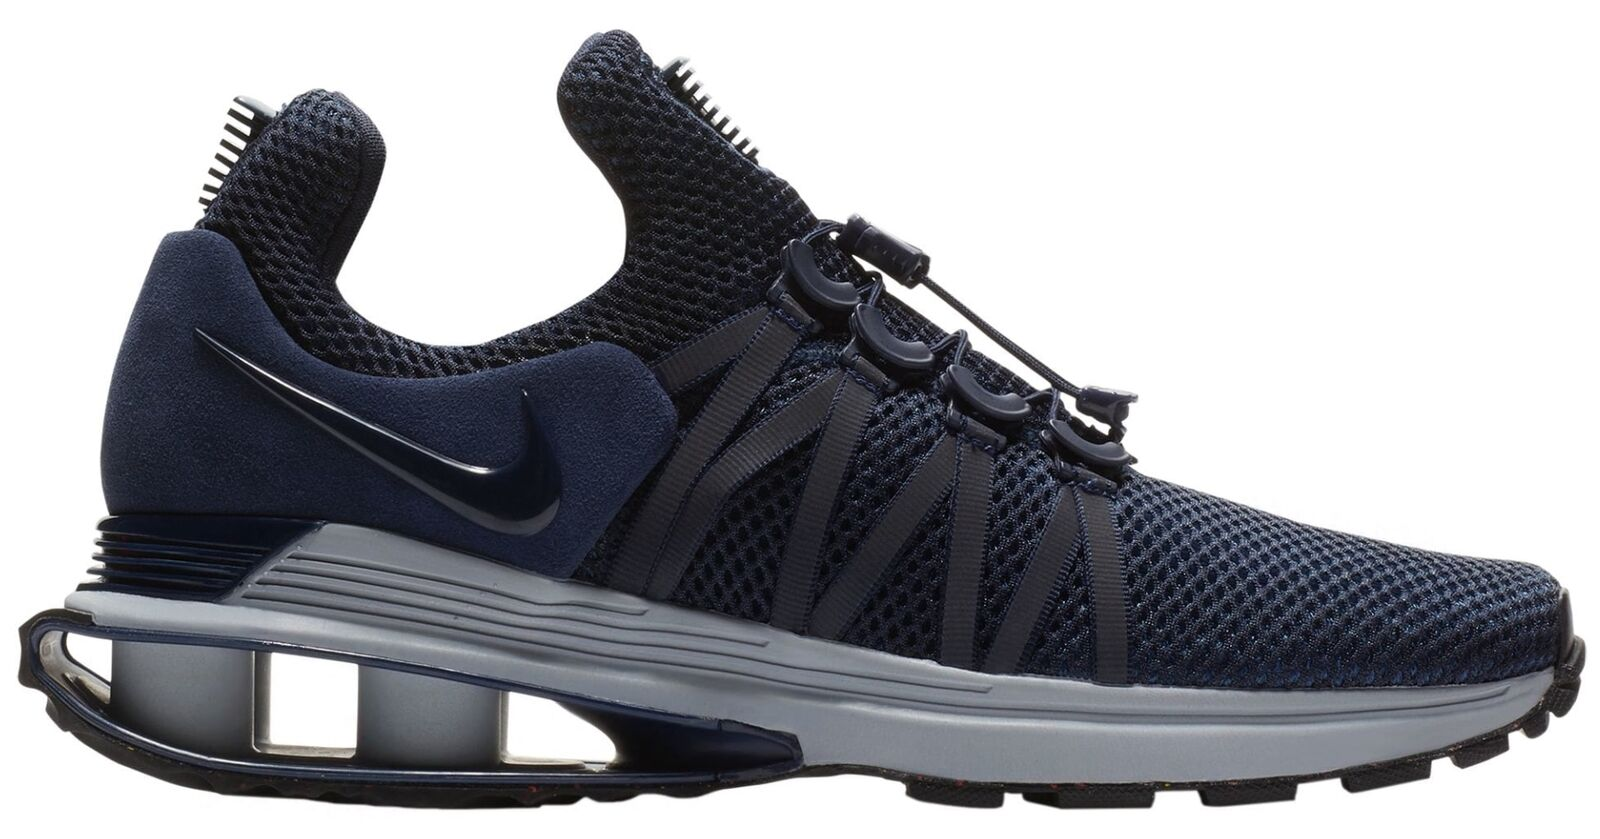 Nike shox schwerkraft mens ar1999-402 obsidian marine   marine laufschuhe  9. 349634